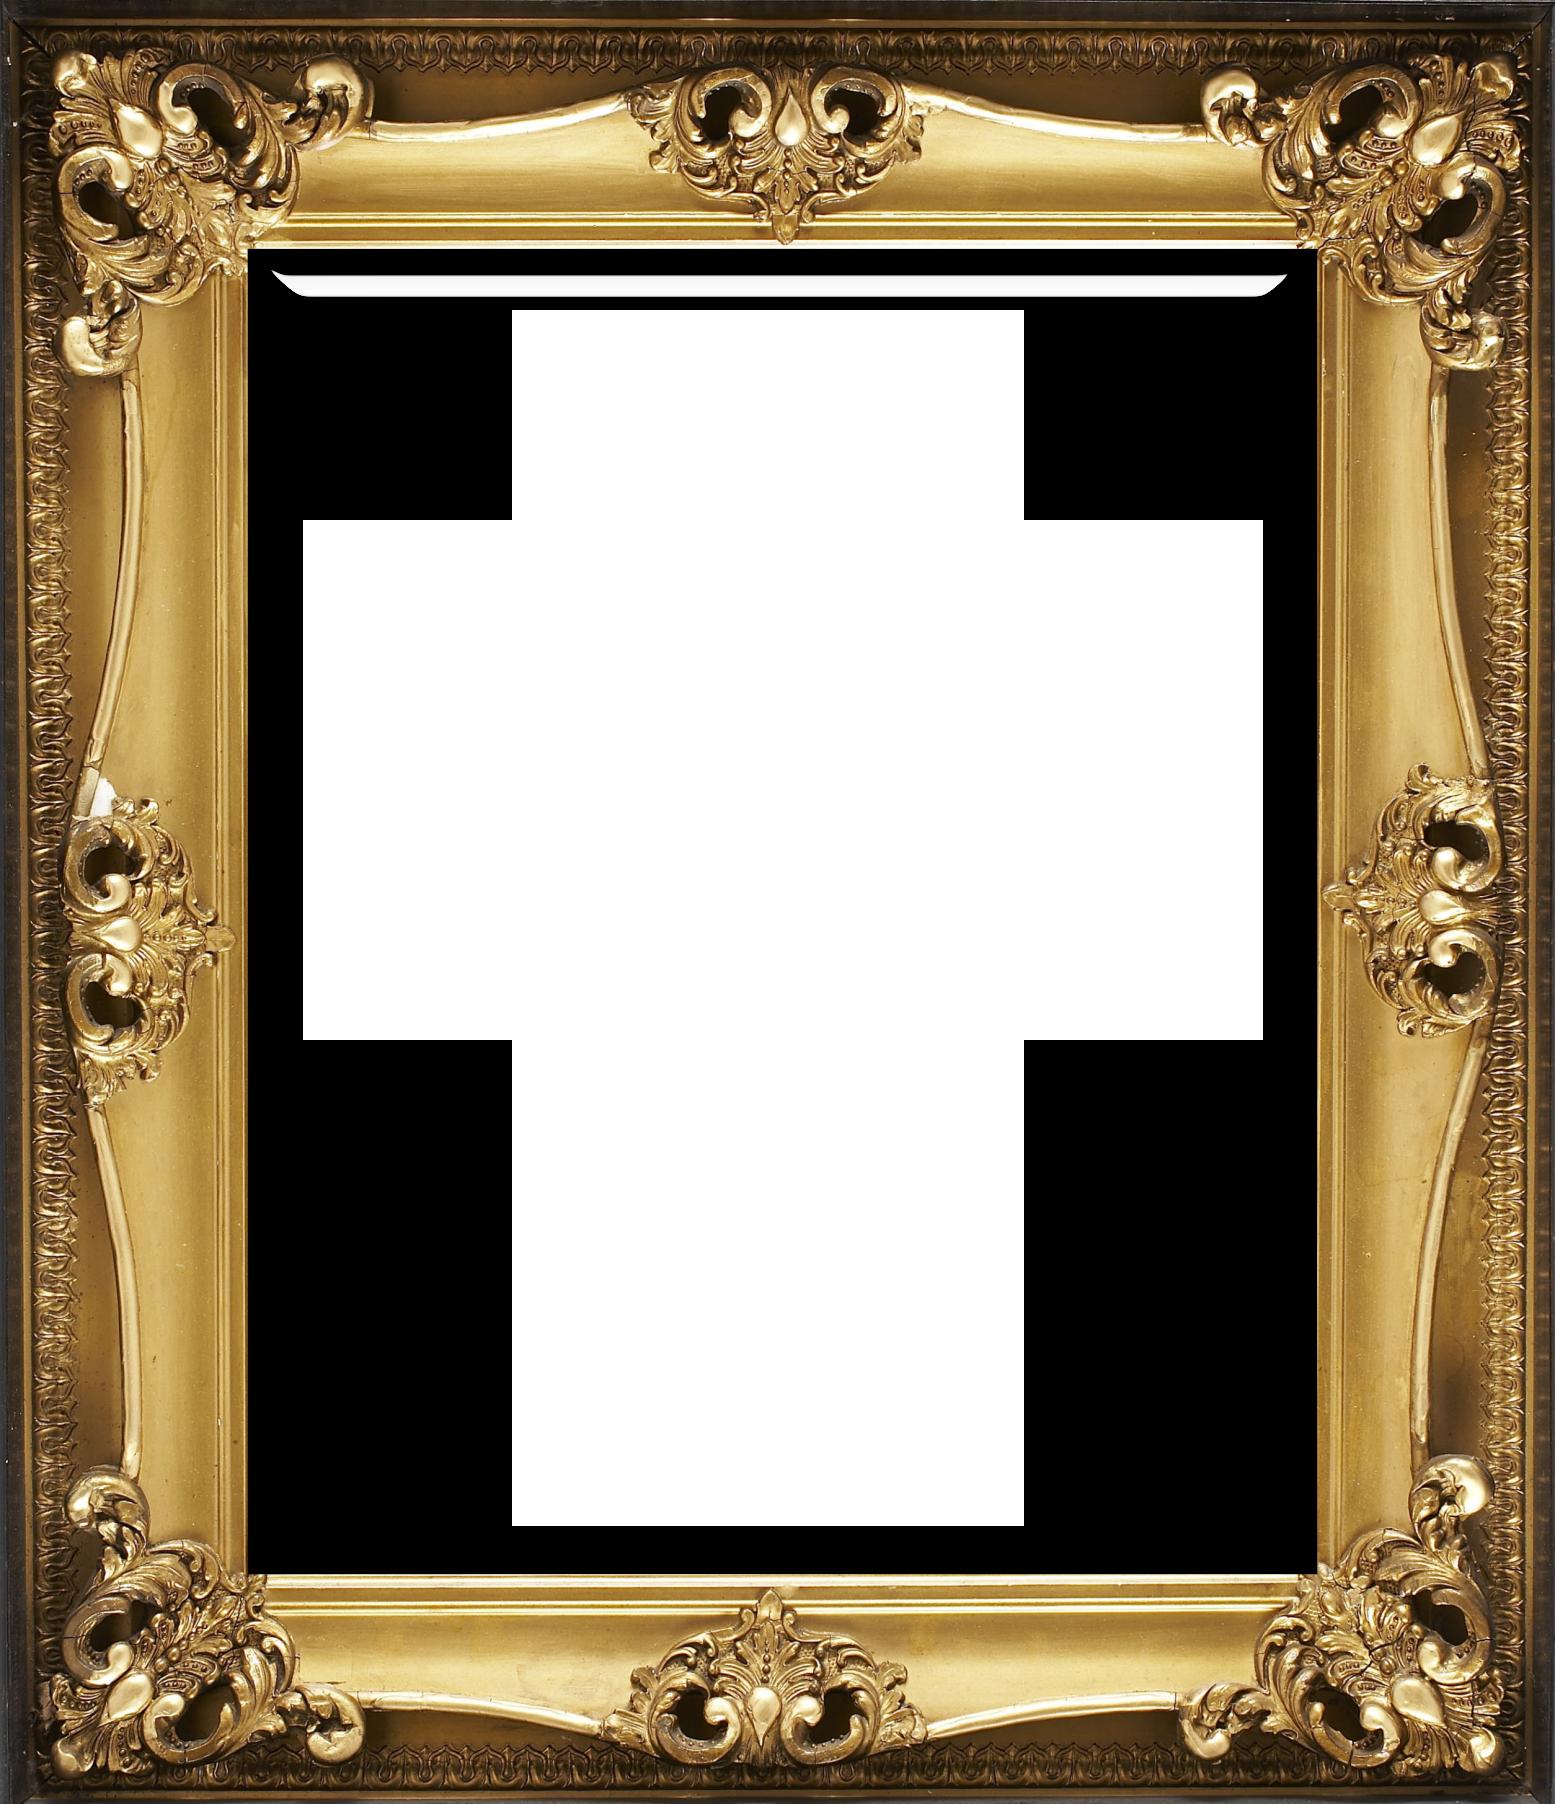 или фото рамок картинок марки